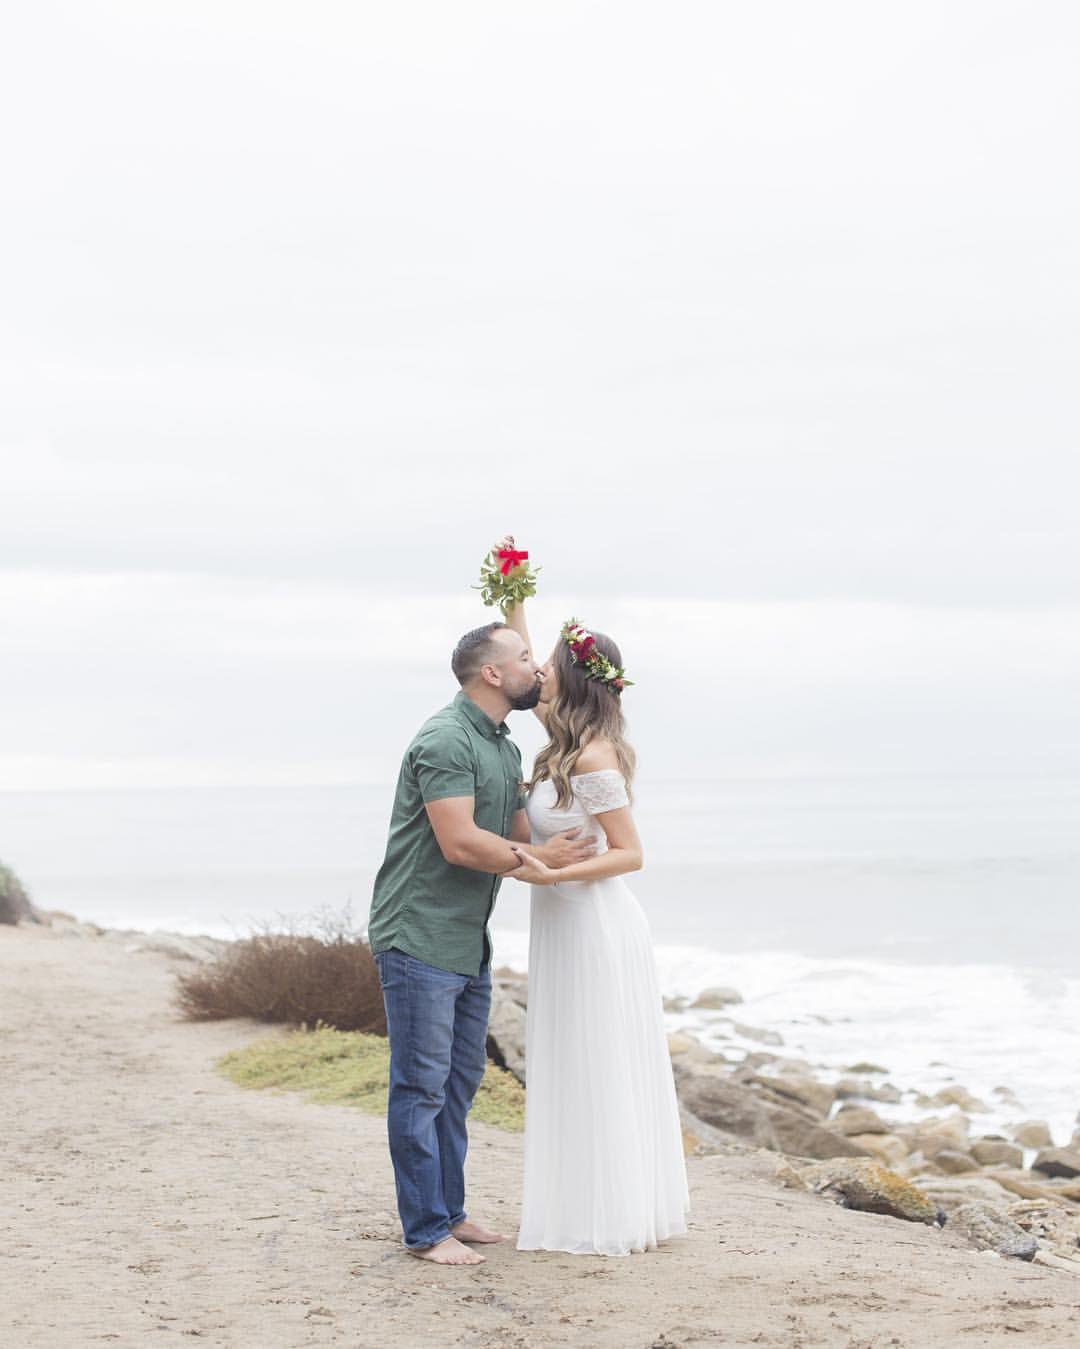 See this Instagram photo by @ashleytara • 21 likes  #pregnancyannouncement #christmascard #beachbabypics #maternity #mamatobe #holiday #babylove #flowercrowns #firstbaby #pregnancyphotography #beachbabypics